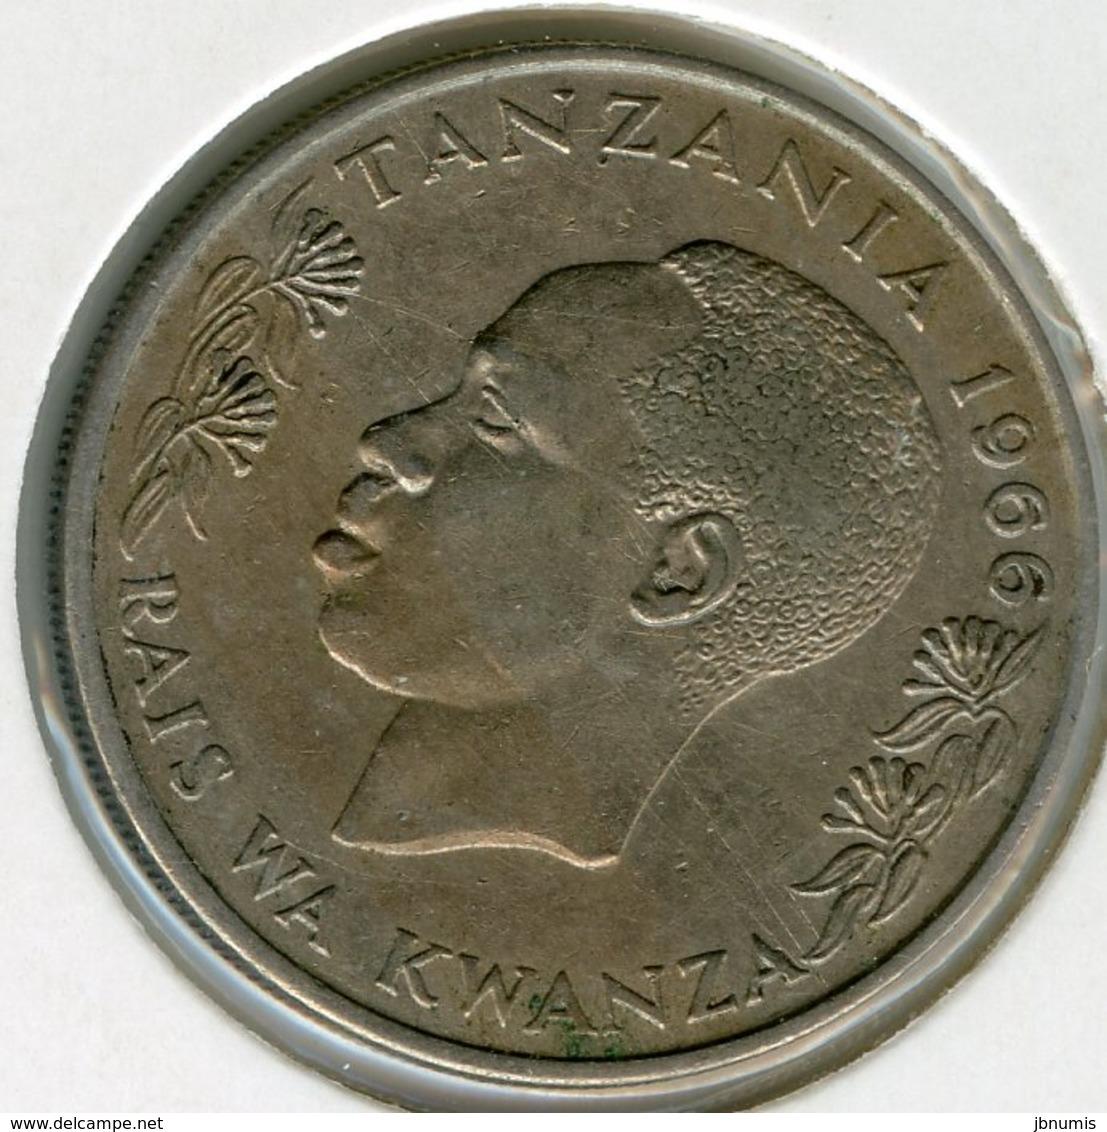 Tanzanie Tanzania 1 Shilingi 1966 KM 4 - Tanzanie